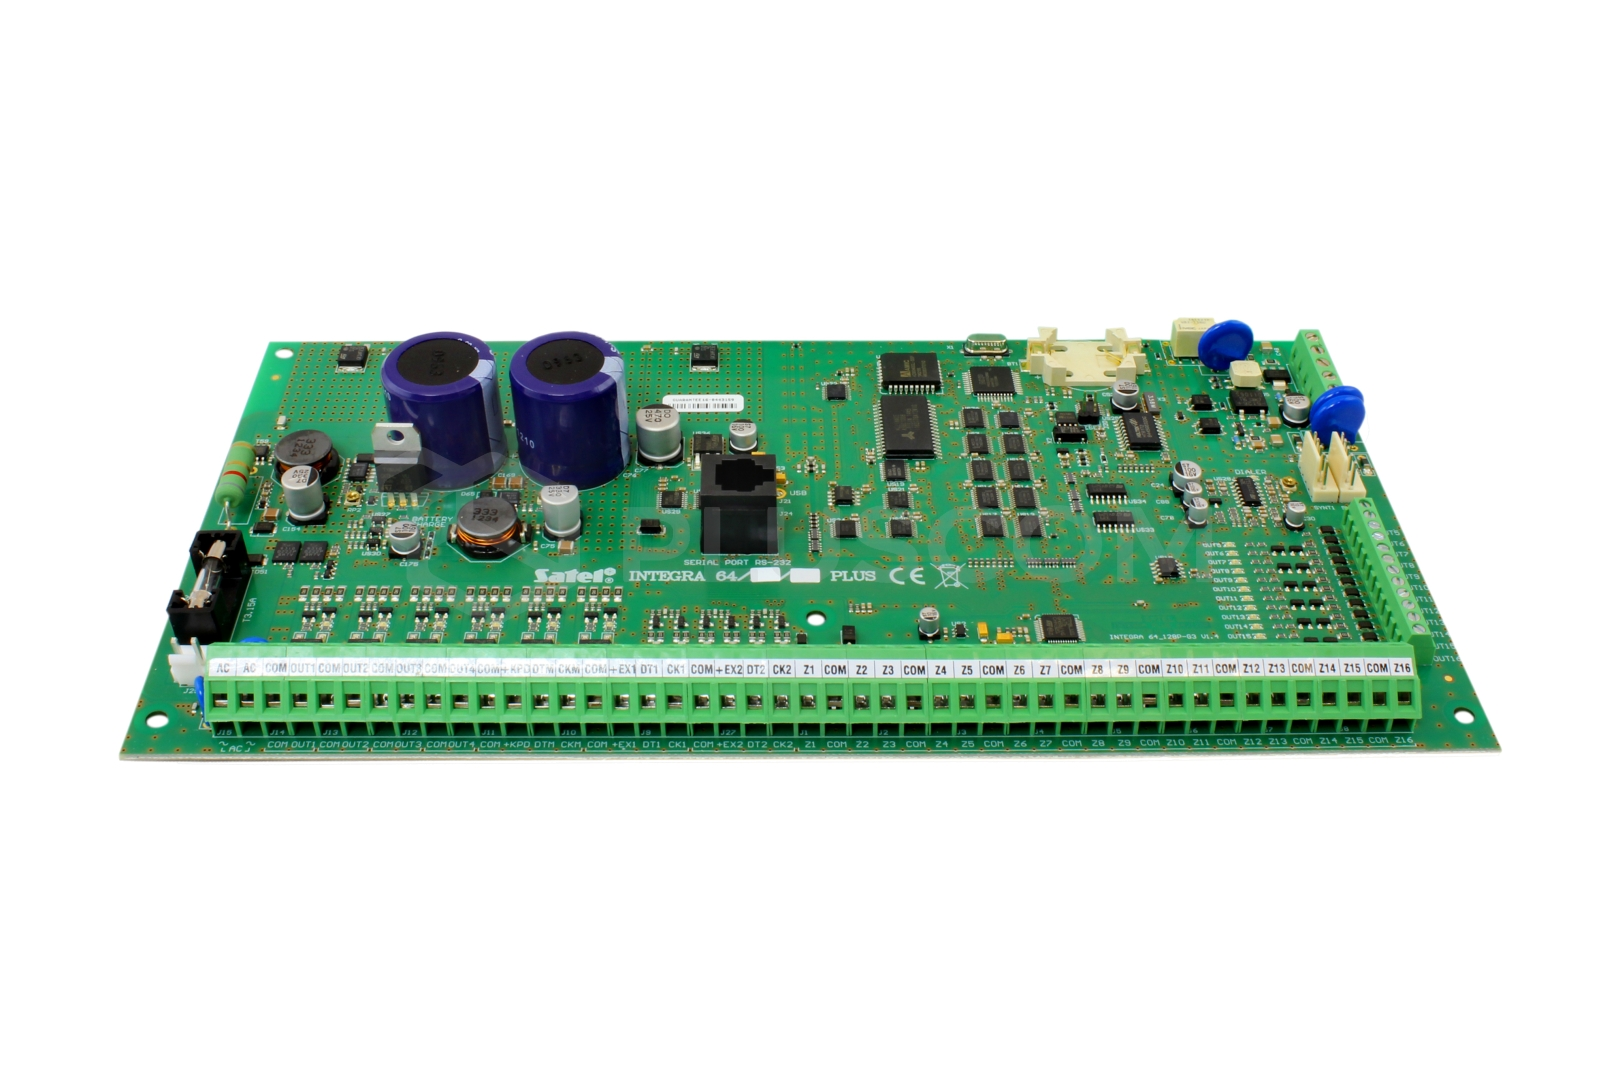 Satel Integra 64 Plus Control Panel With 16 Up To 64 Zones